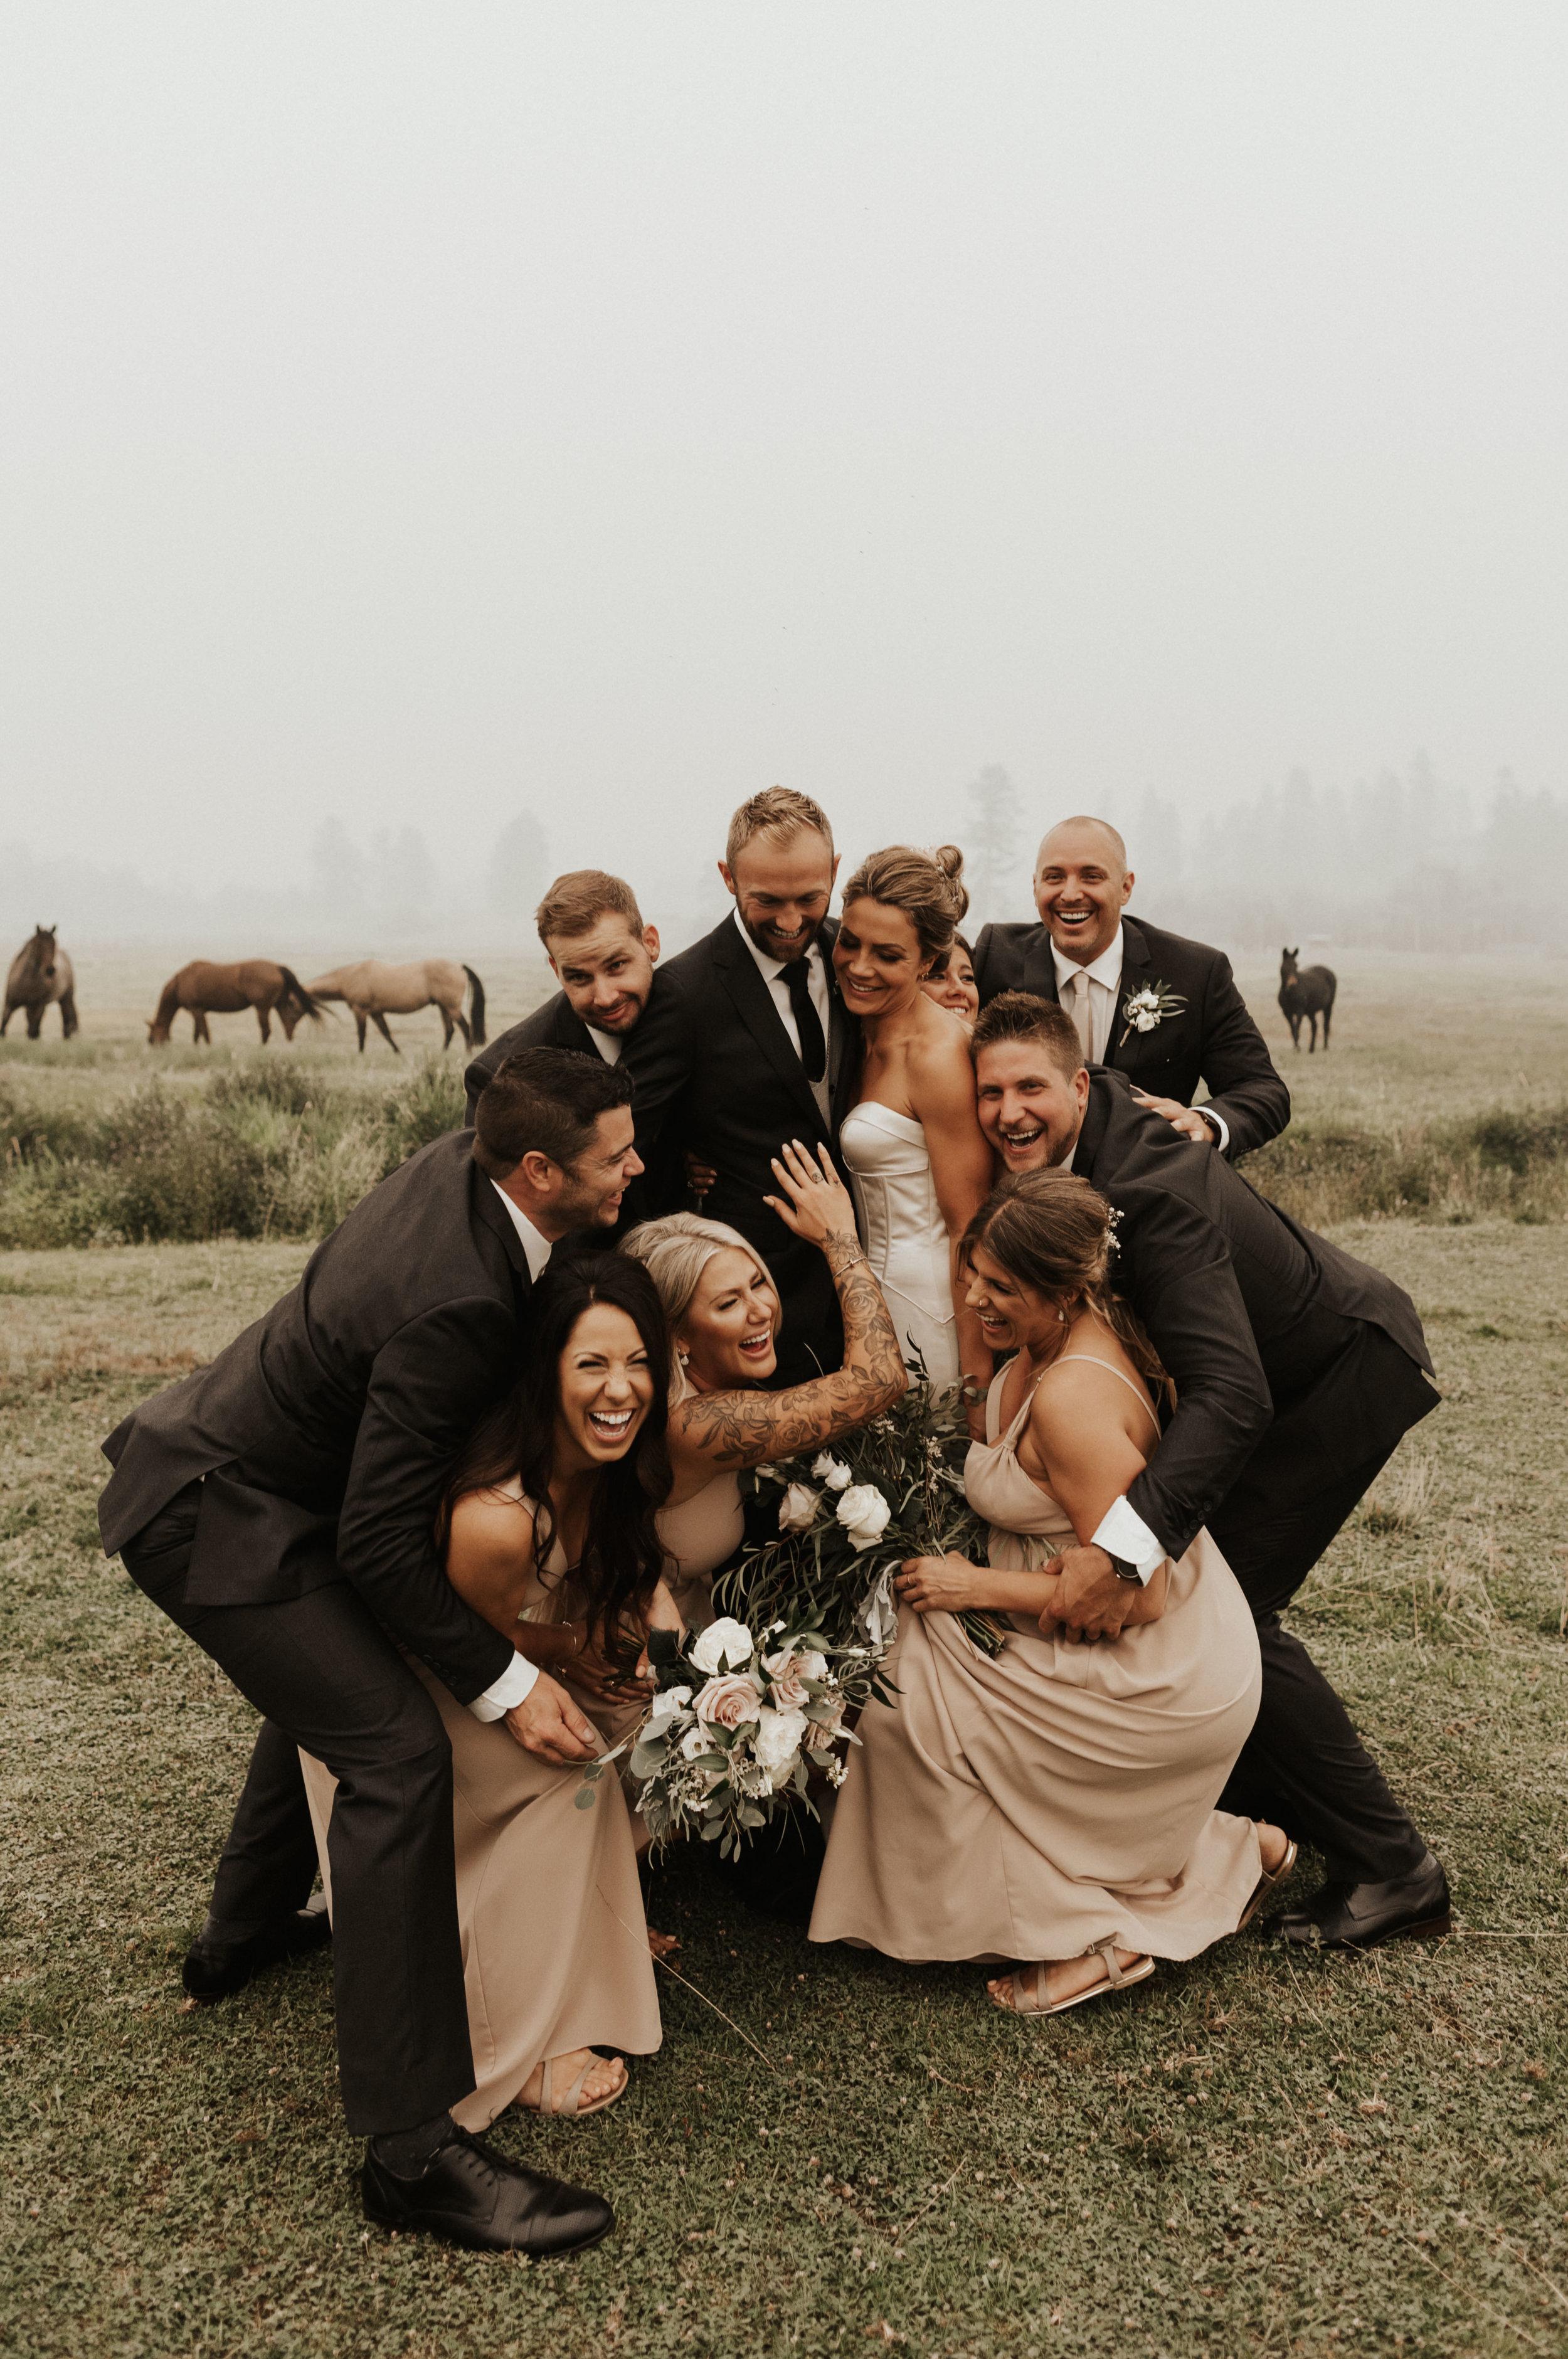 weddingparty_briannarecordphotography-oklahomaweddingphotographer31.jpg